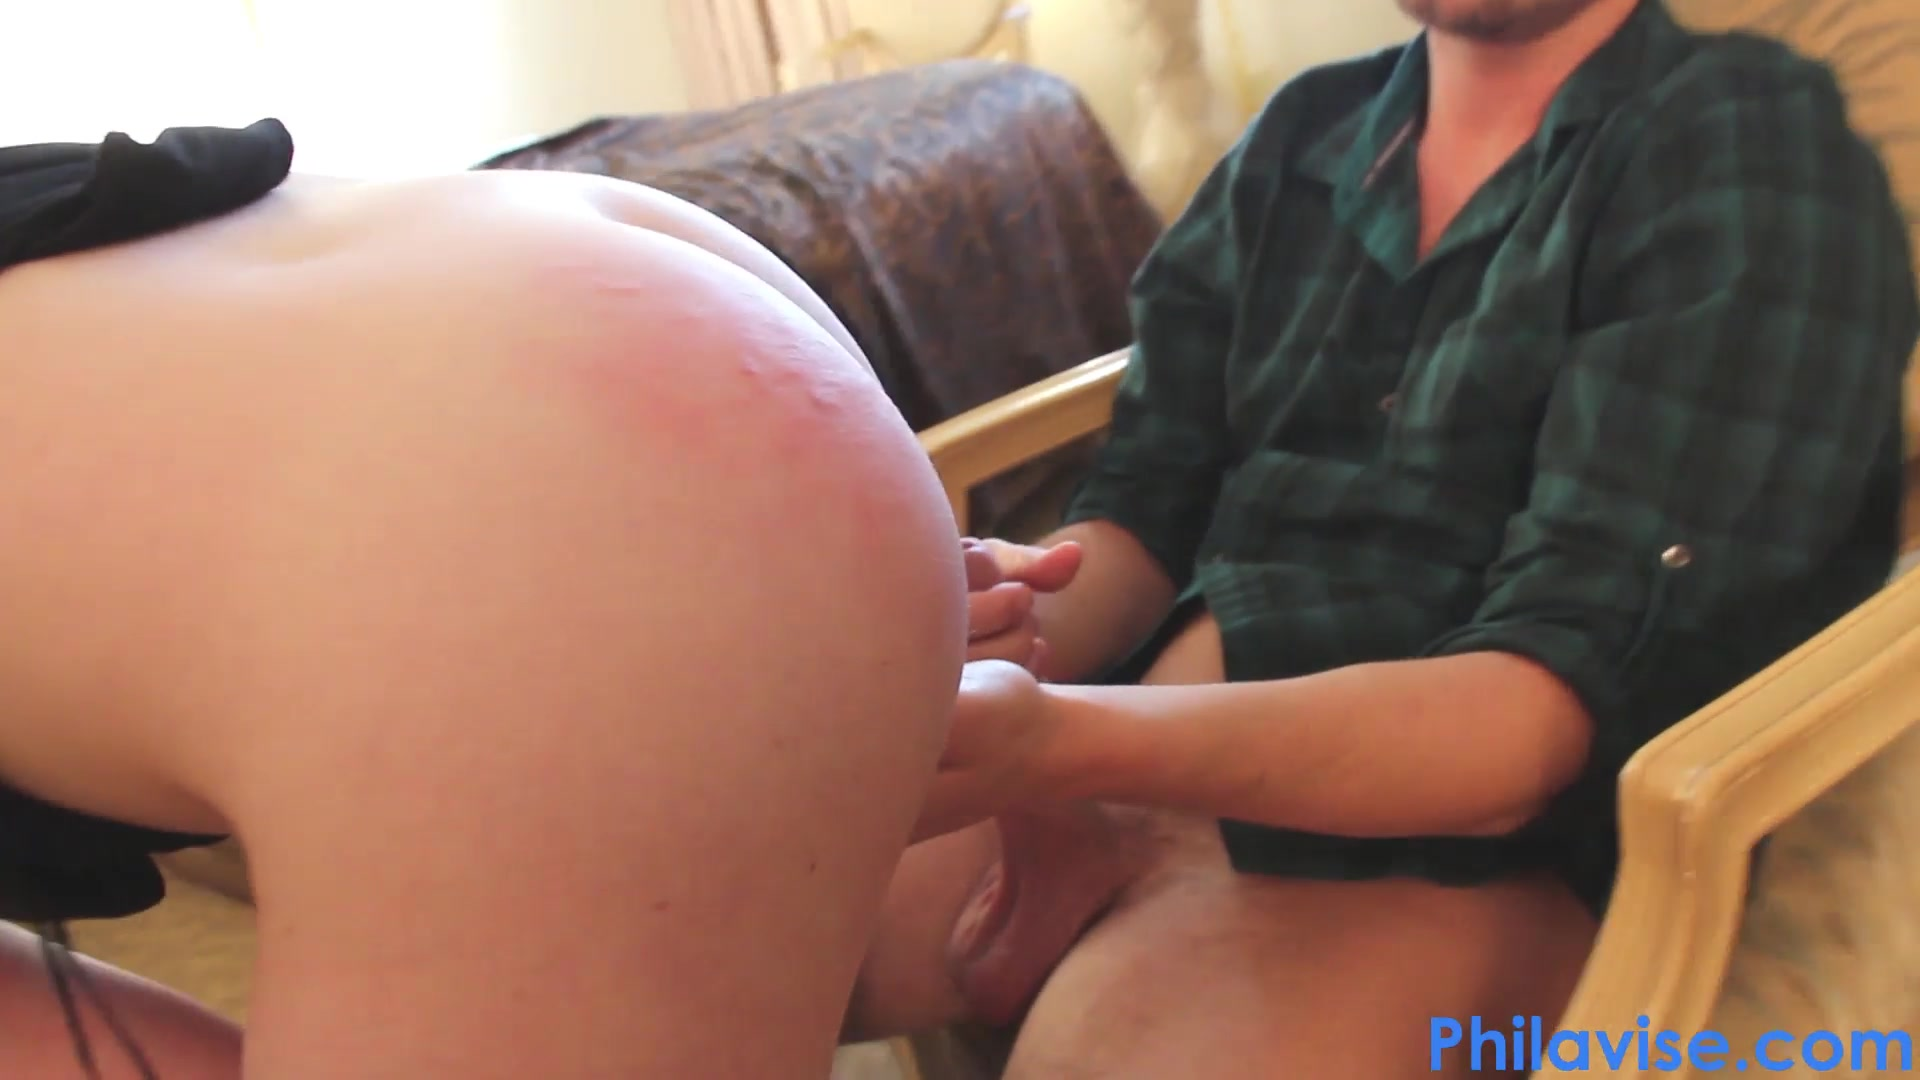 XXX Porn tube Marilyn chambers threesome